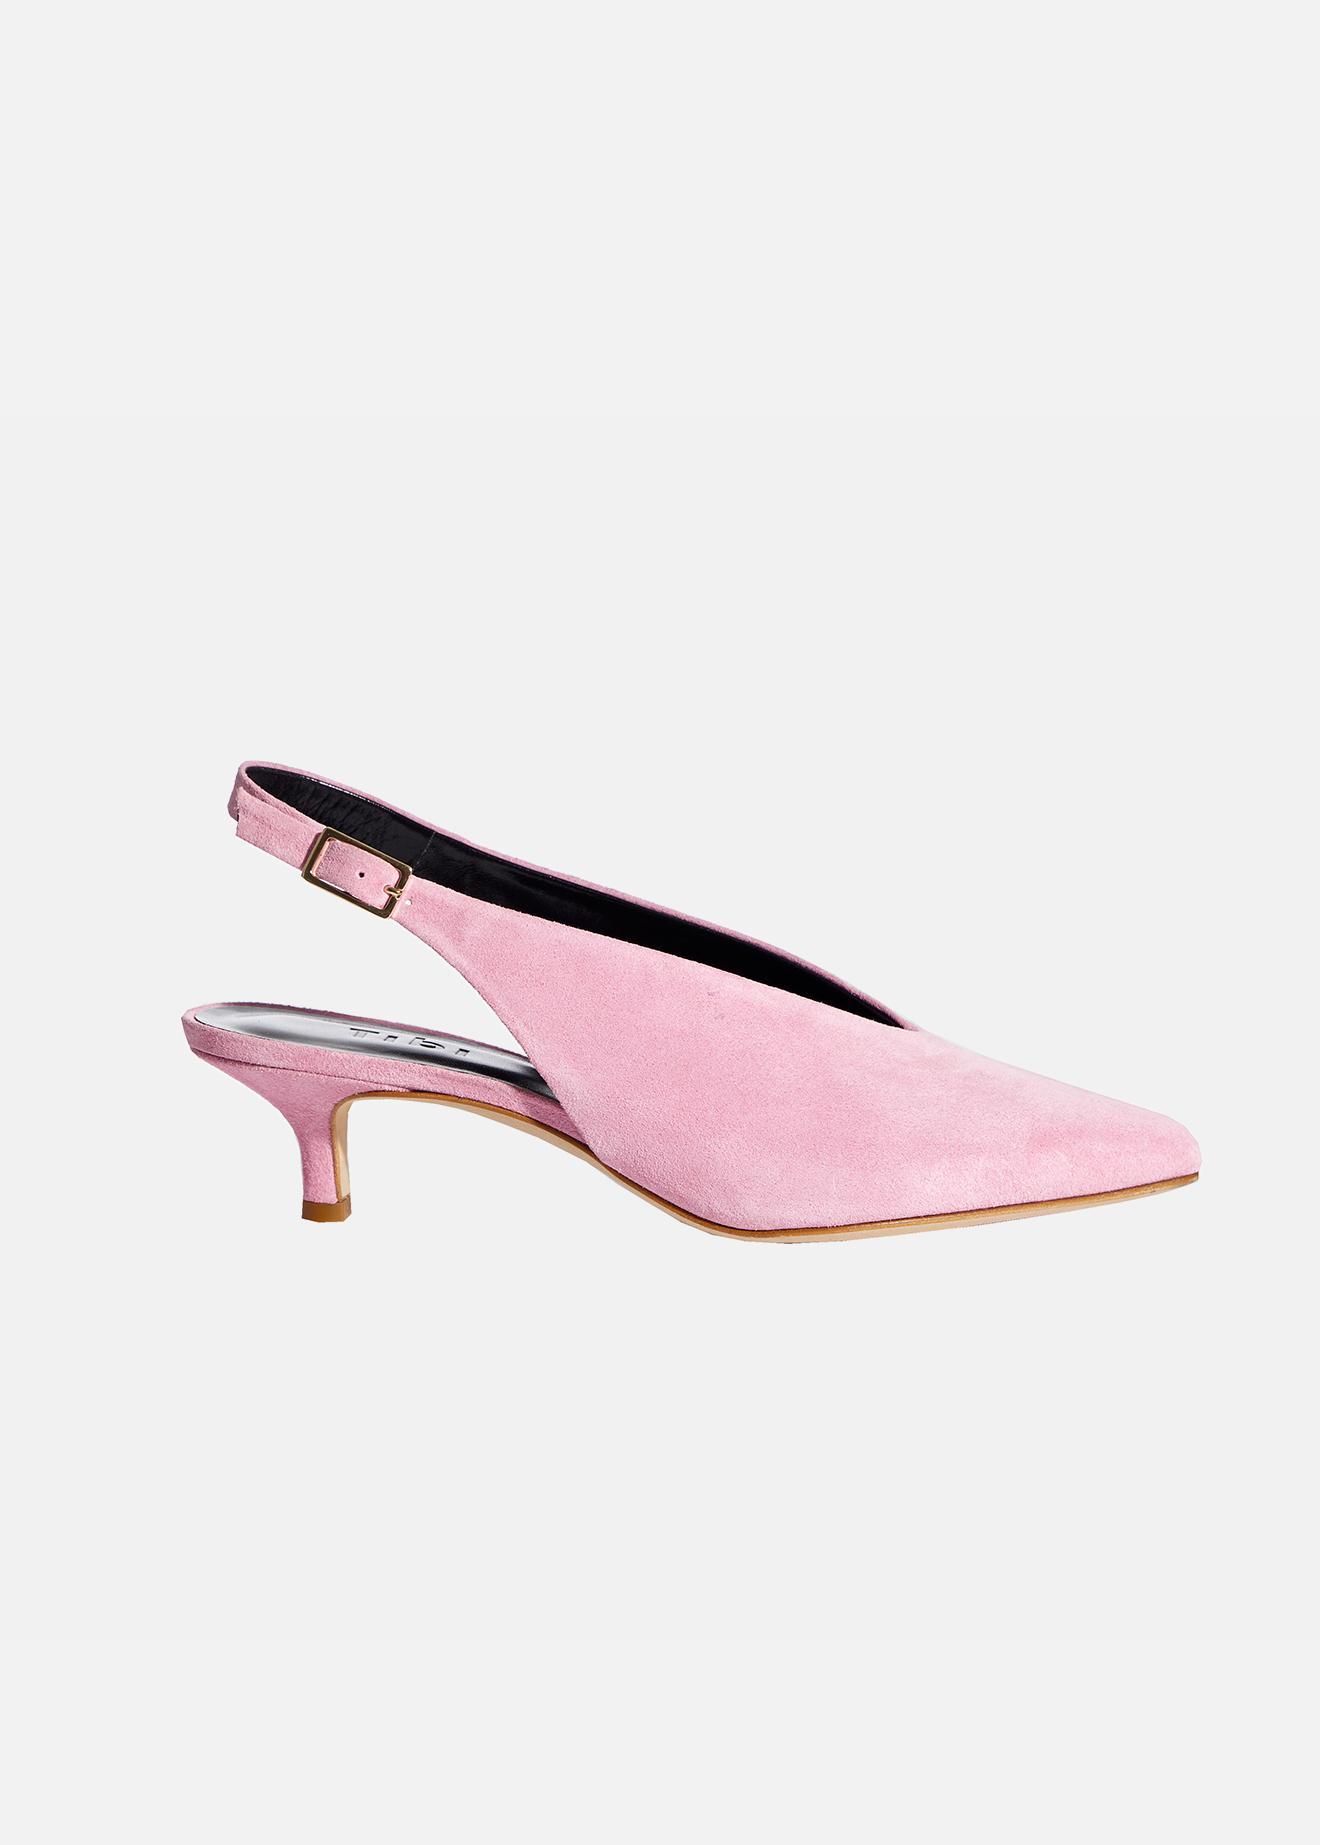 ff6b85c3fe6 Lyst - Tibi Lia Heels in Pink